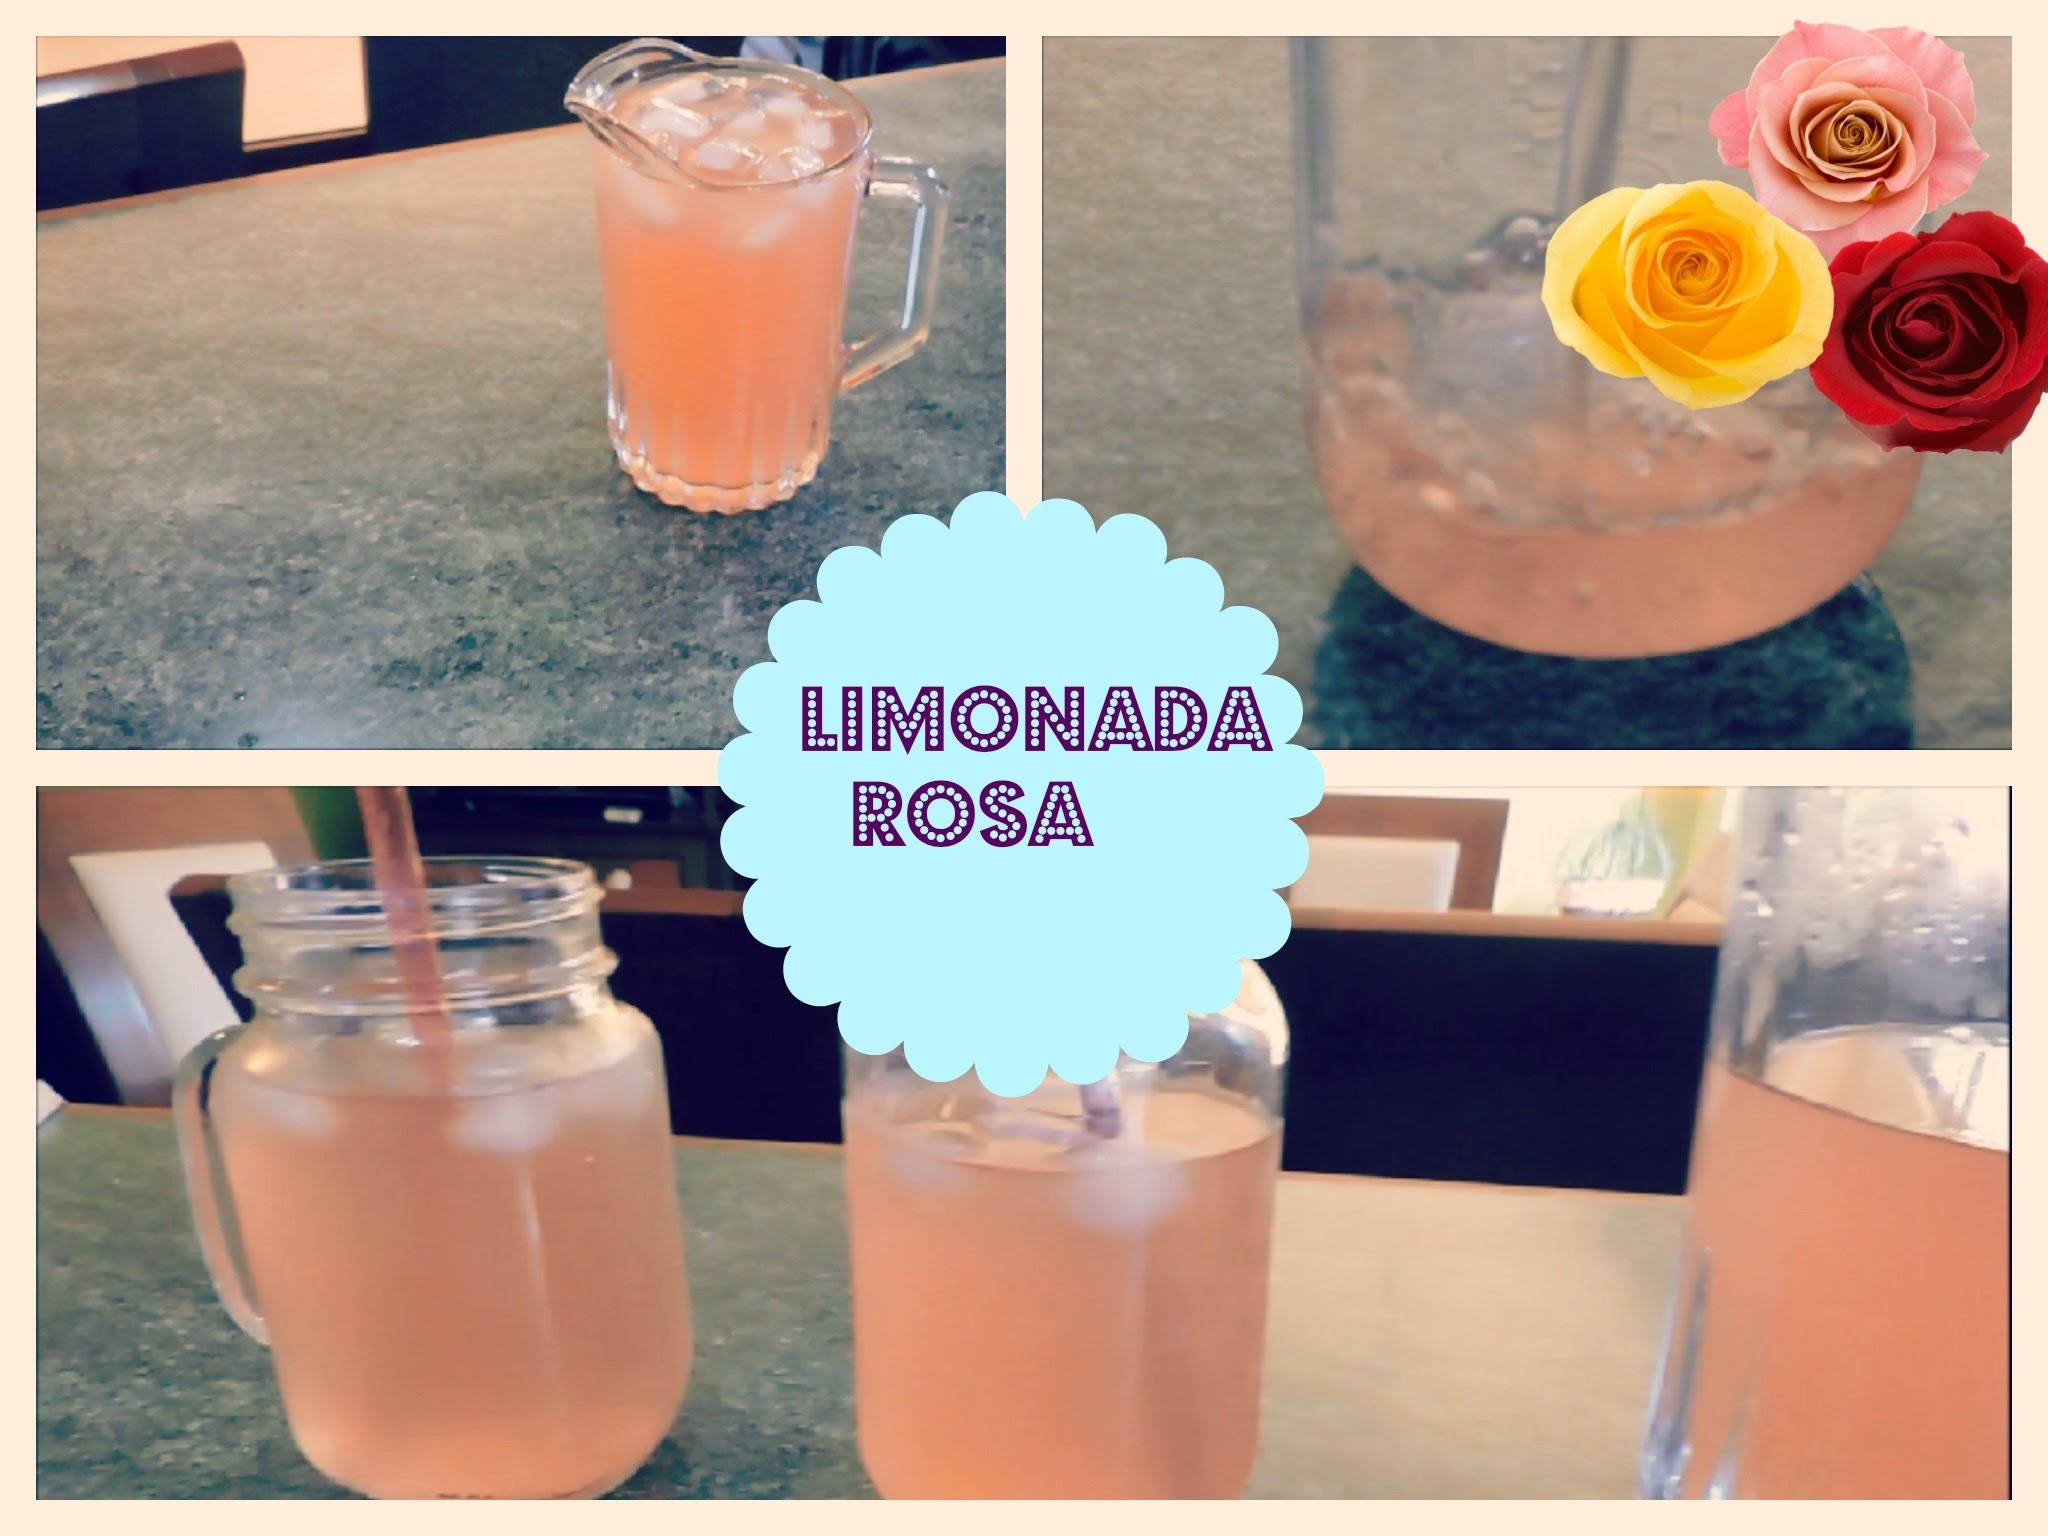 D.I.Y limonada rosa.Pink Lemonade